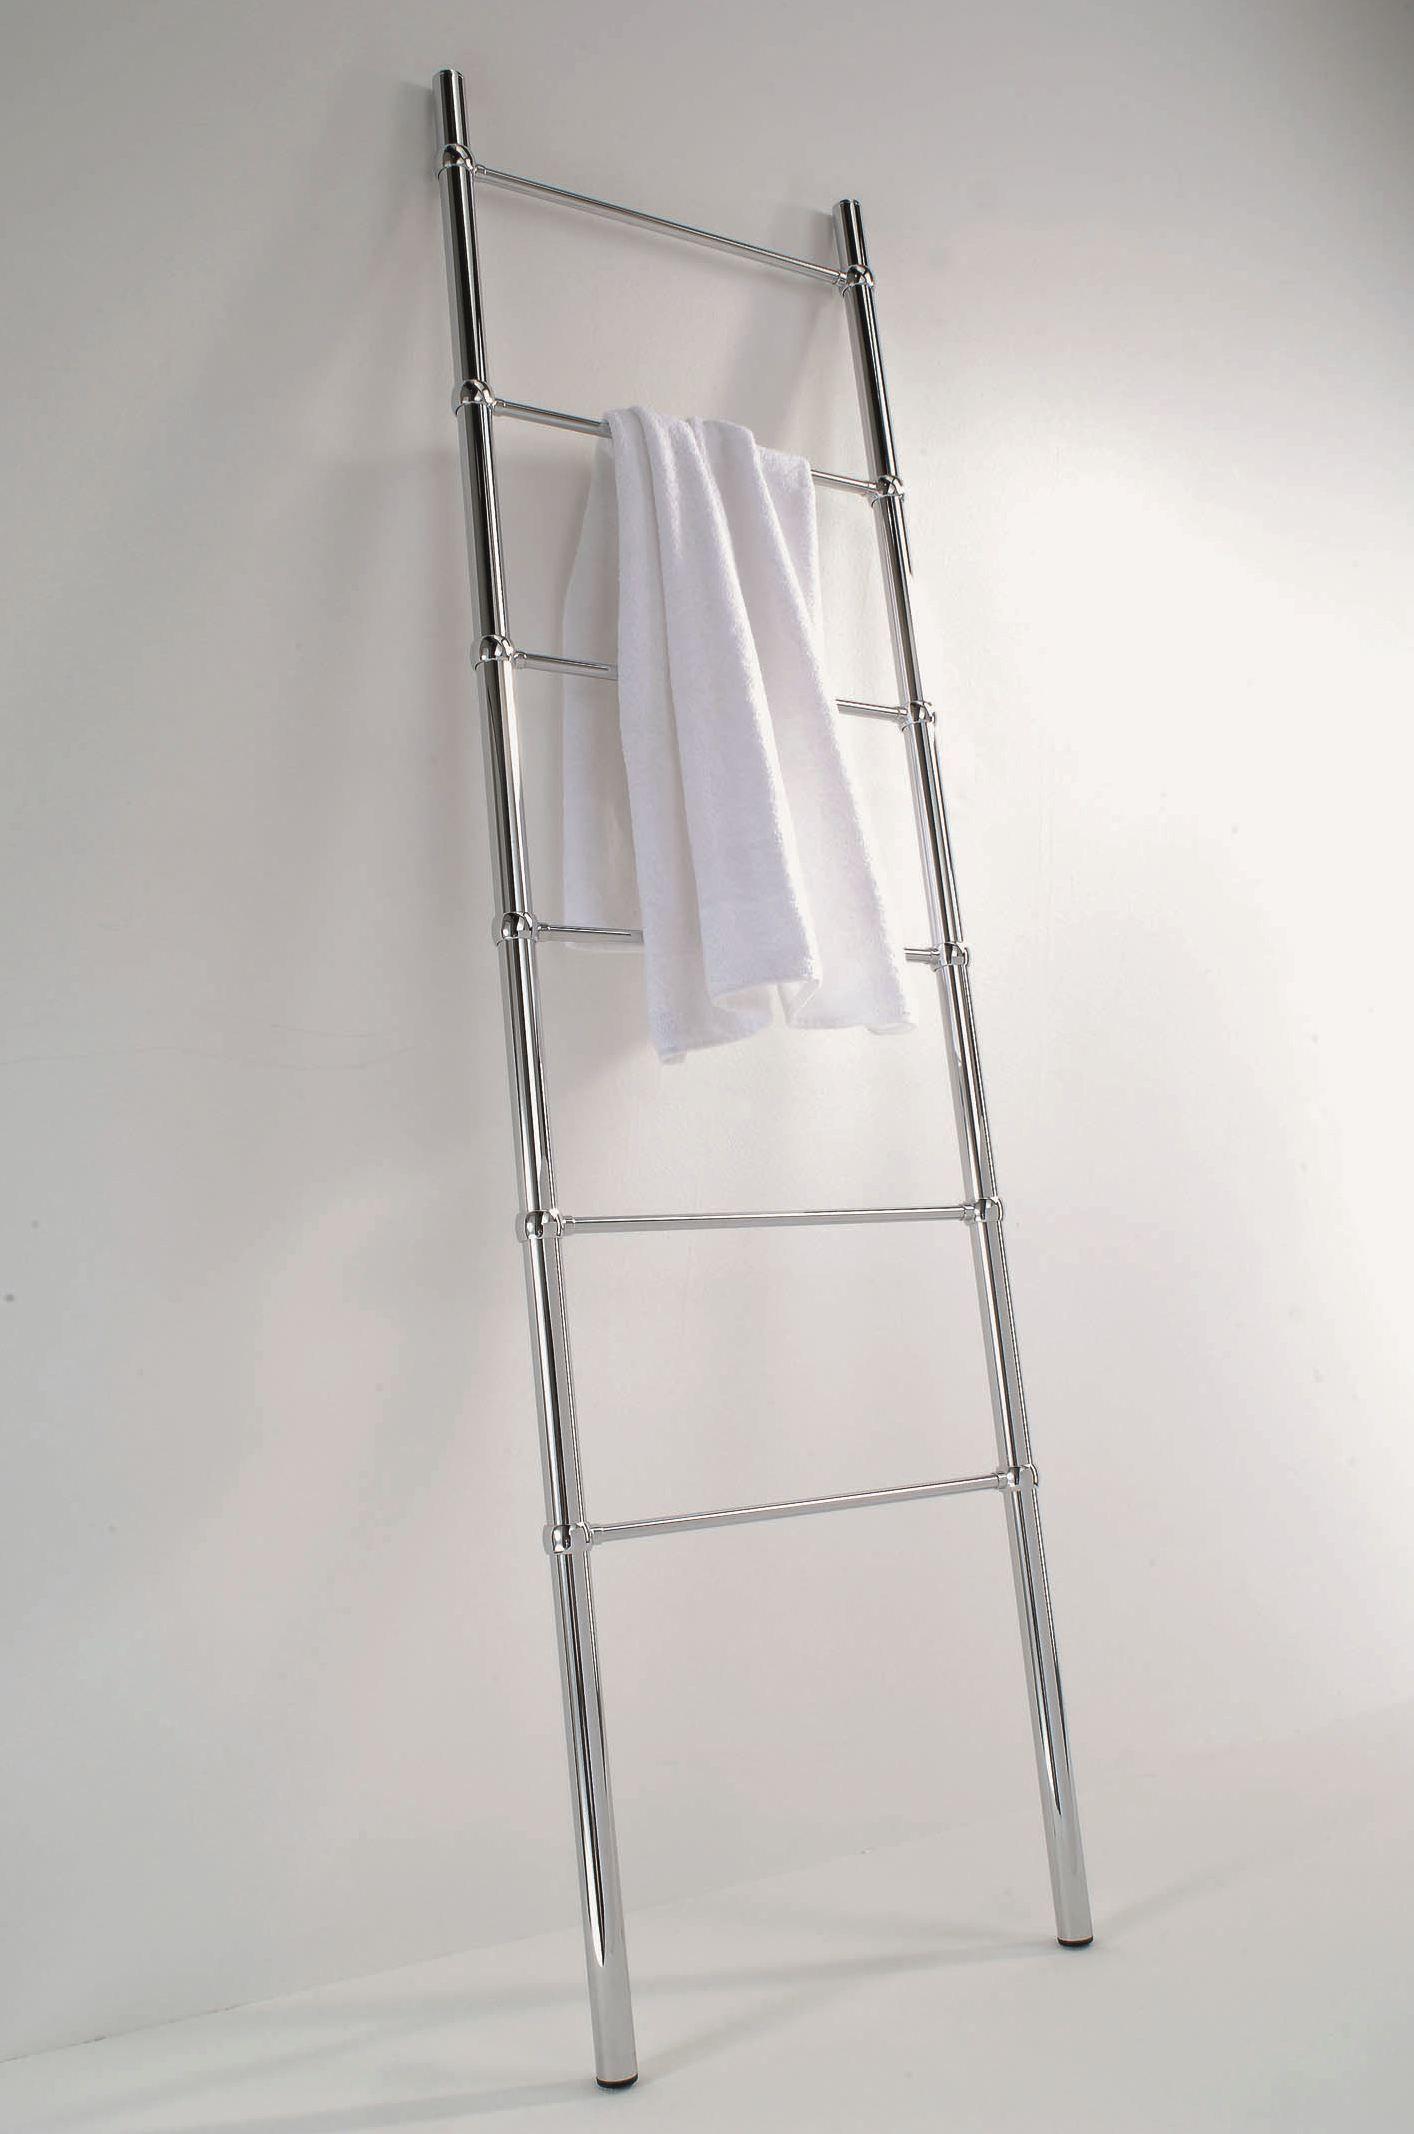 porte serviettes sur pied htl 50 by decor walther. Black Bedroom Furniture Sets. Home Design Ideas